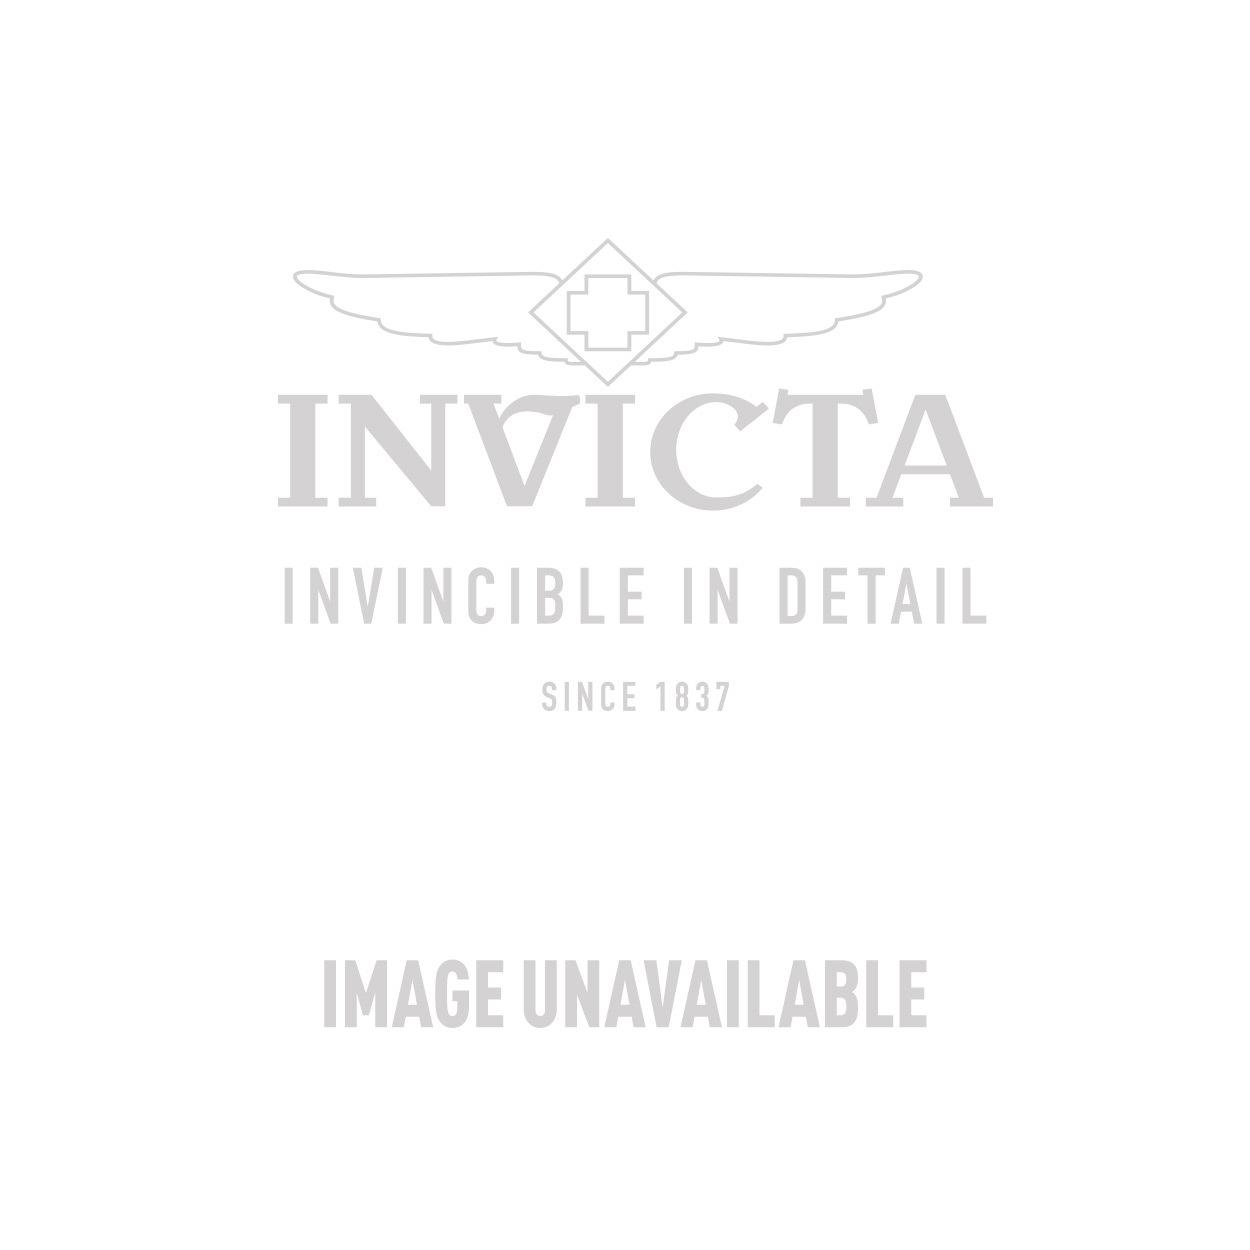 Invicta Sea Base  Automatic Watch - Gold, Black case with Gold, Black tone Titanium band - Model 14226